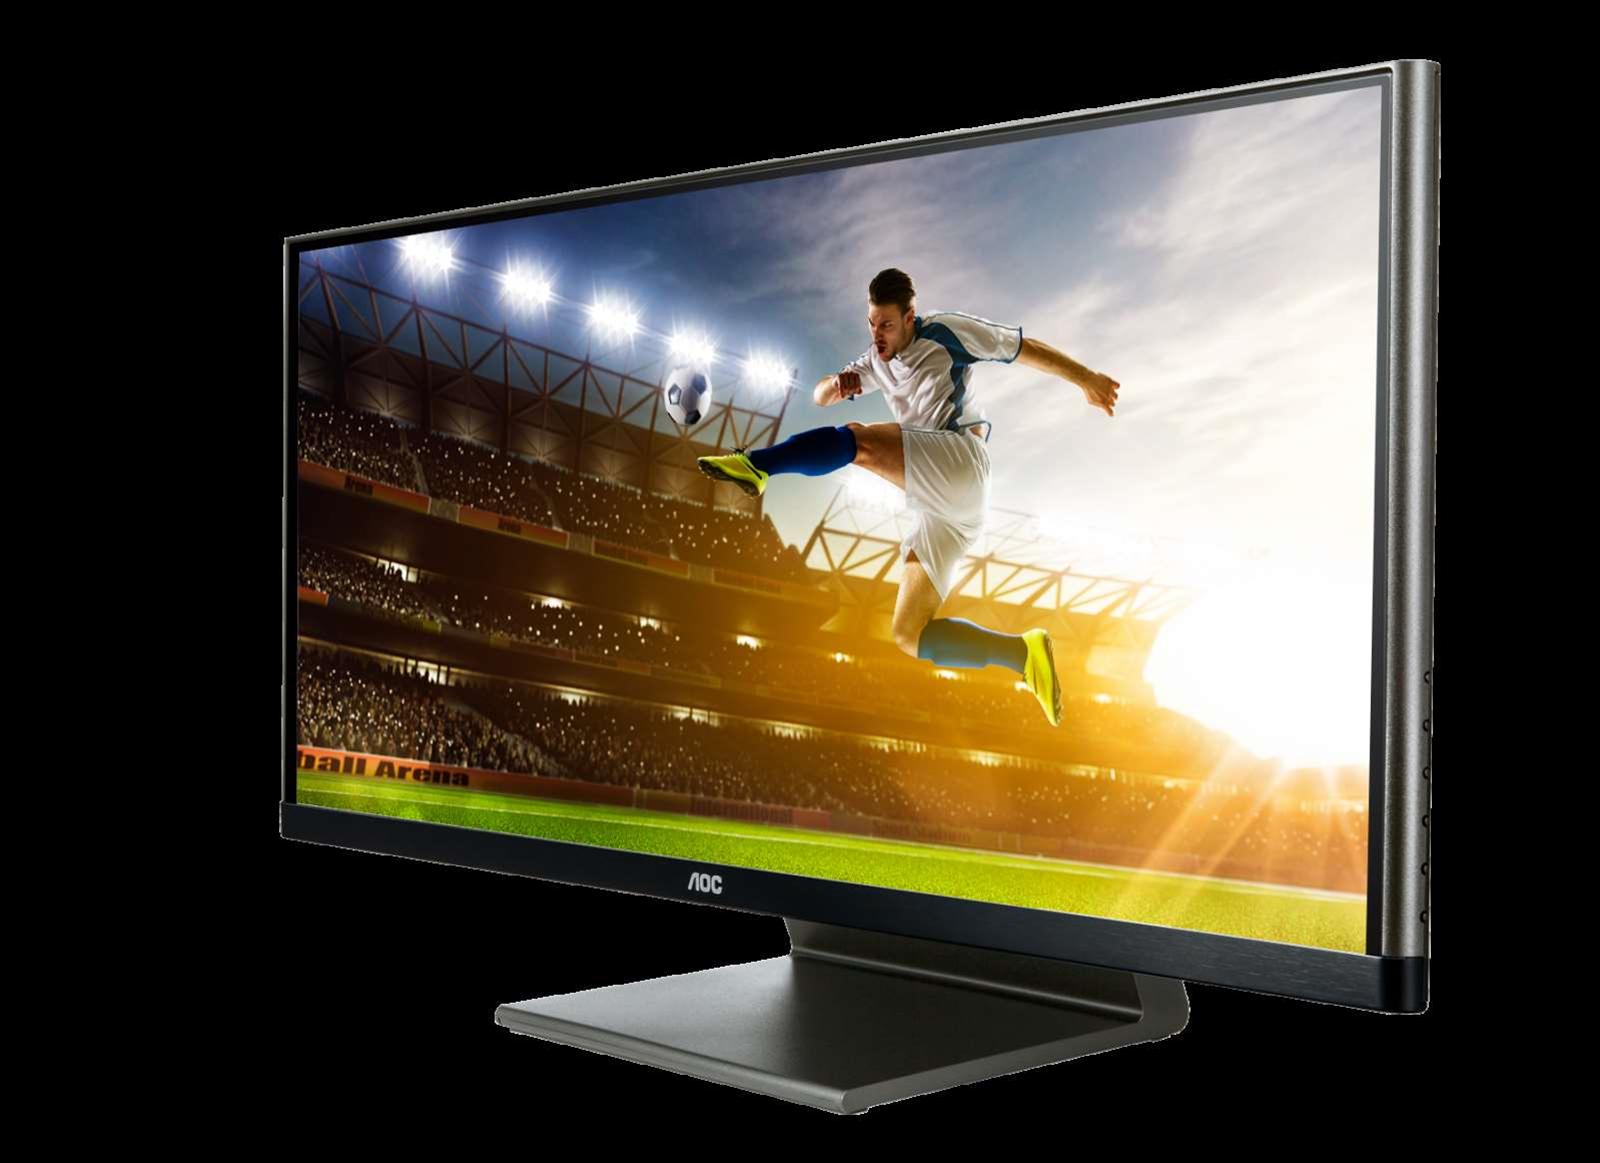 AOC reveals 29in UltraWide Q2963PQ display